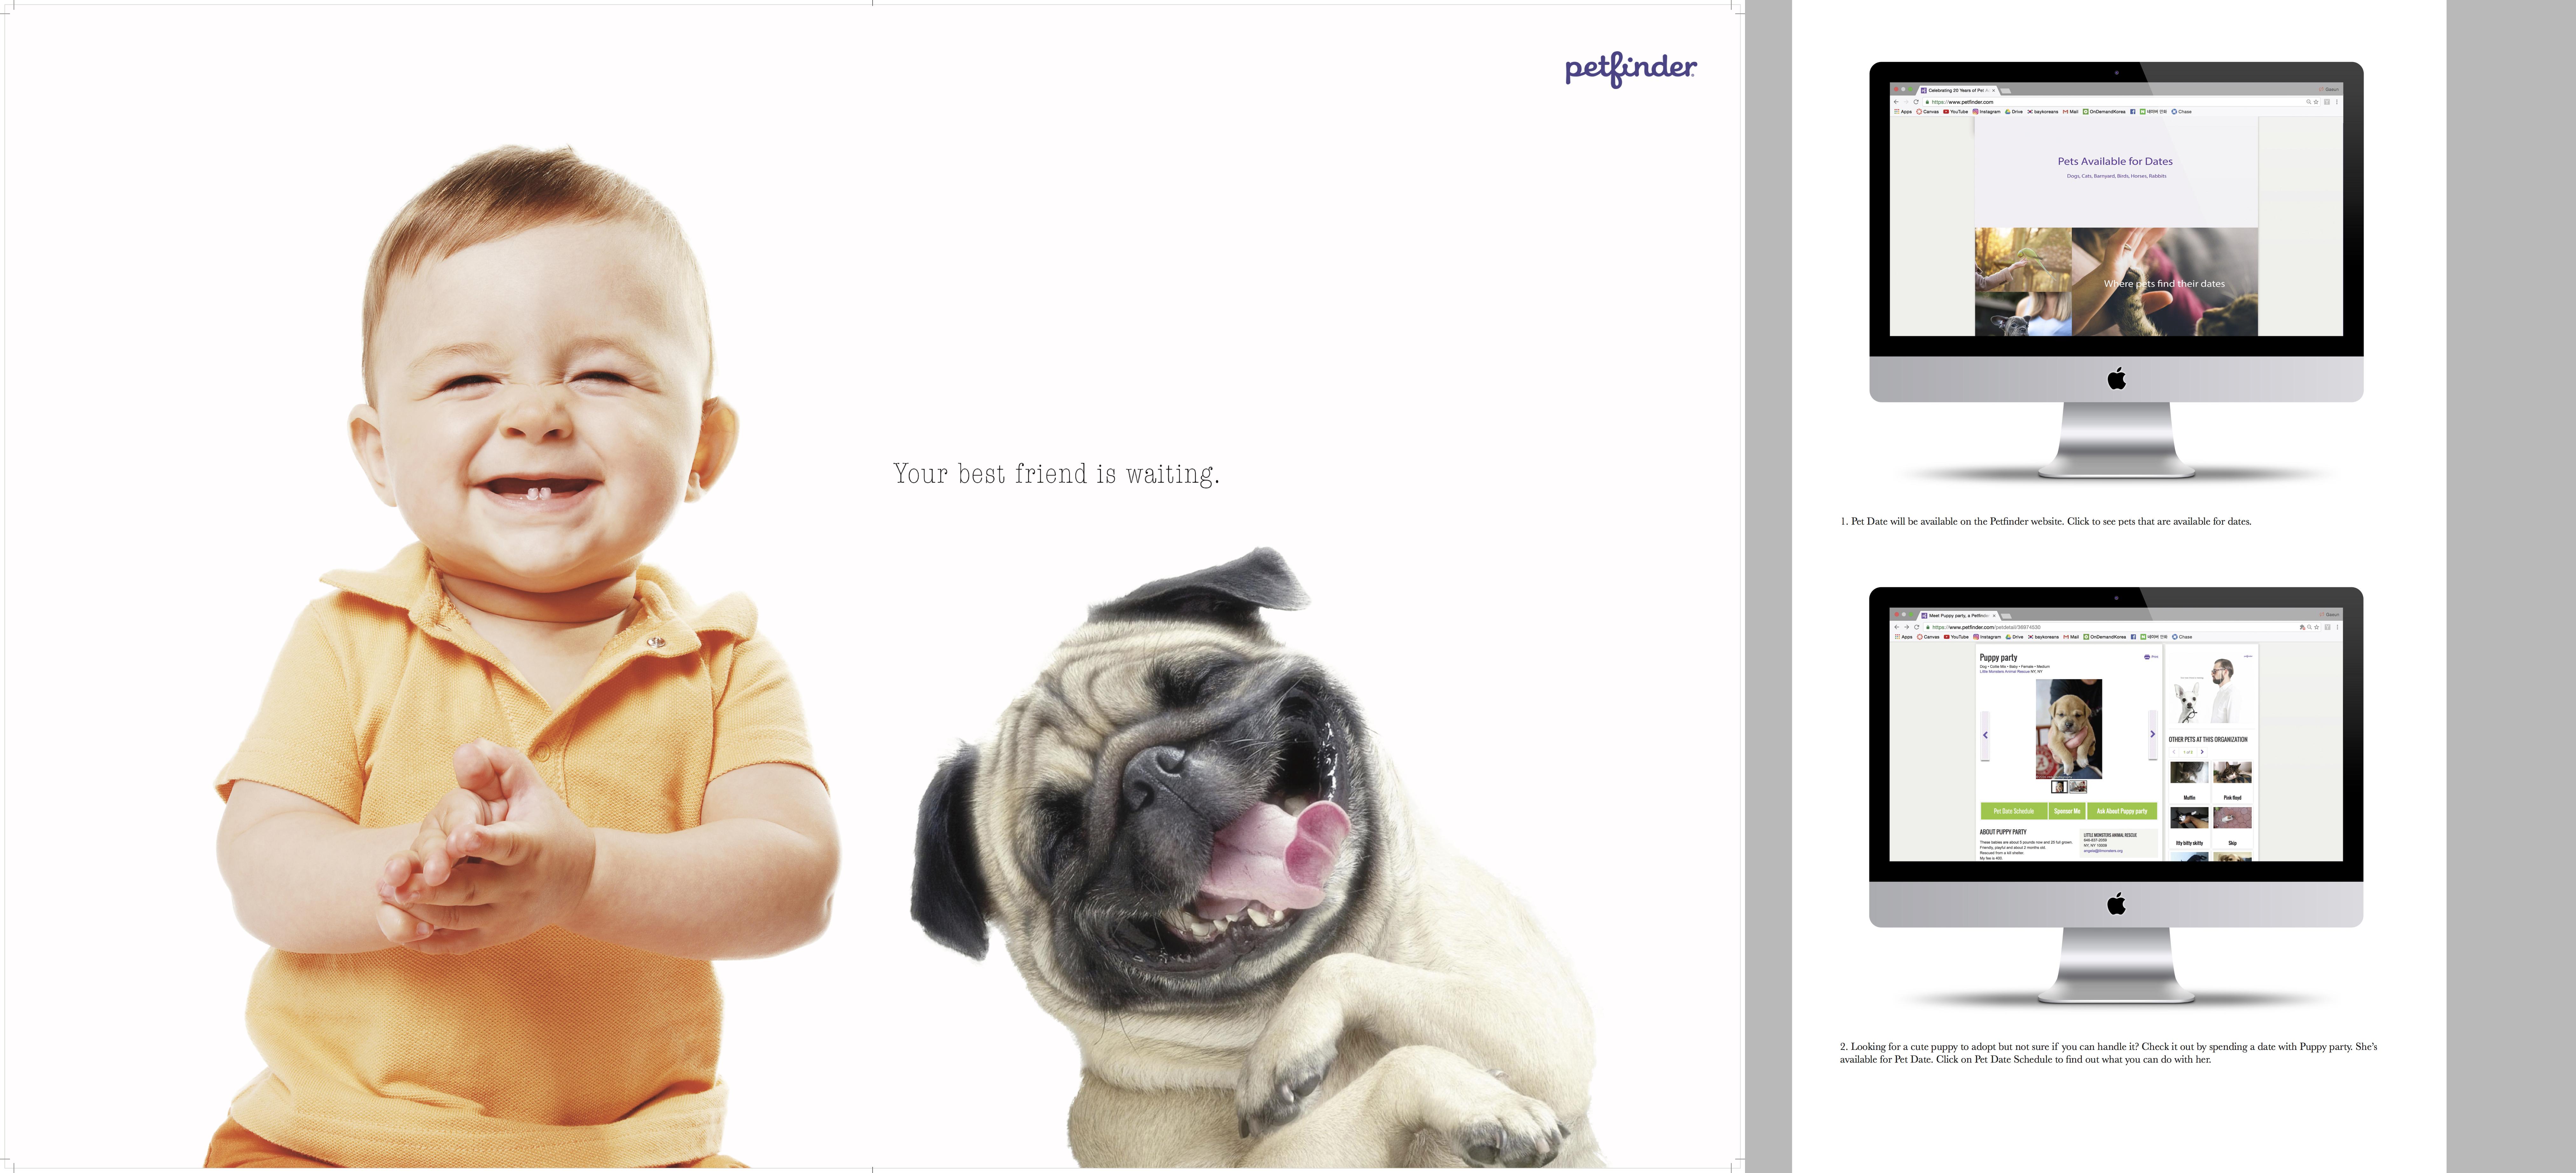 Petfinder.com  Campaign + App & Web